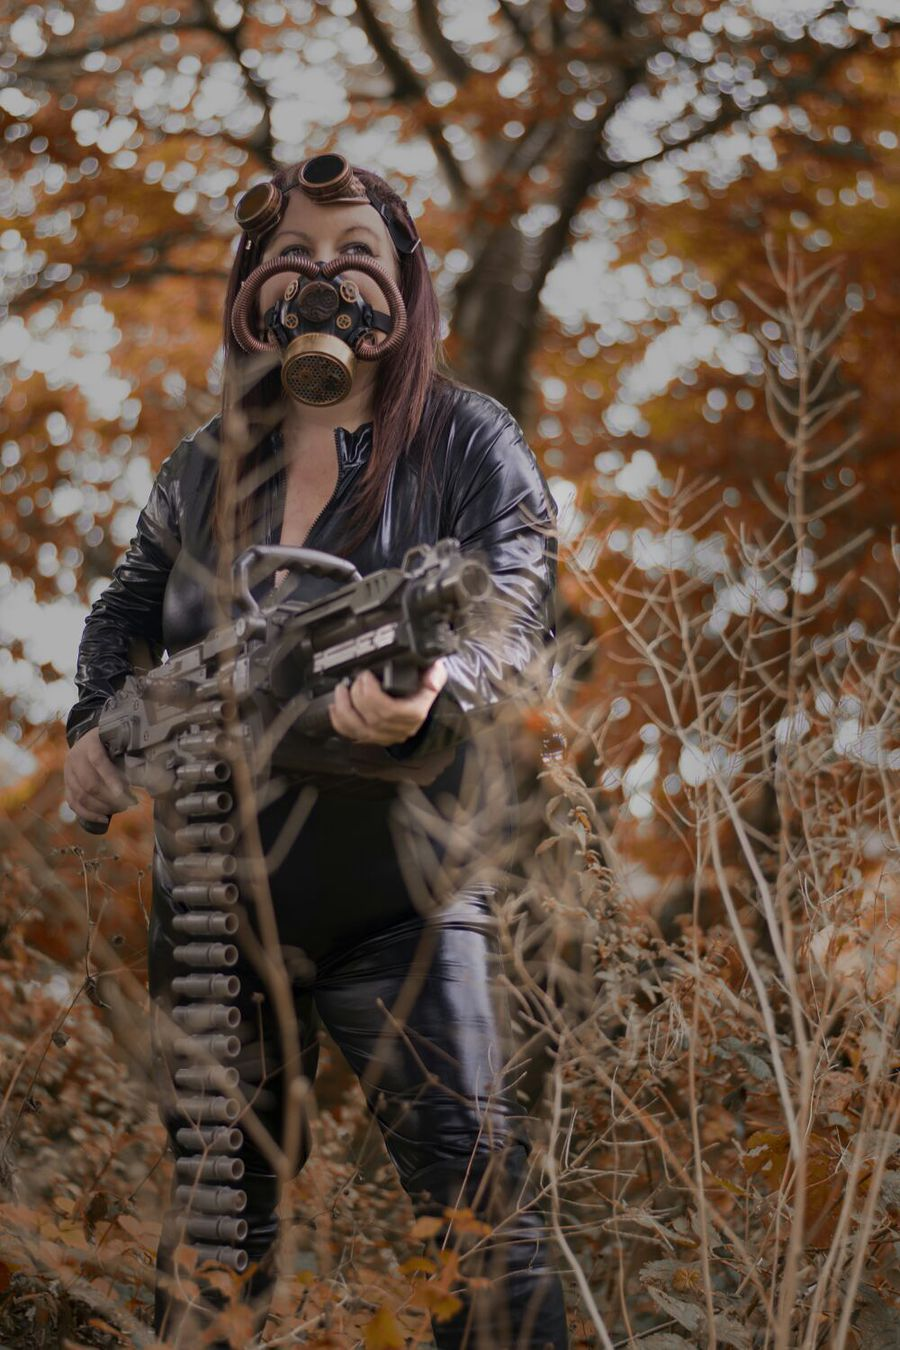 Steampunk warrior / Model Sammi71 / Uploaded 21st October 2016 @ 10:29 AM